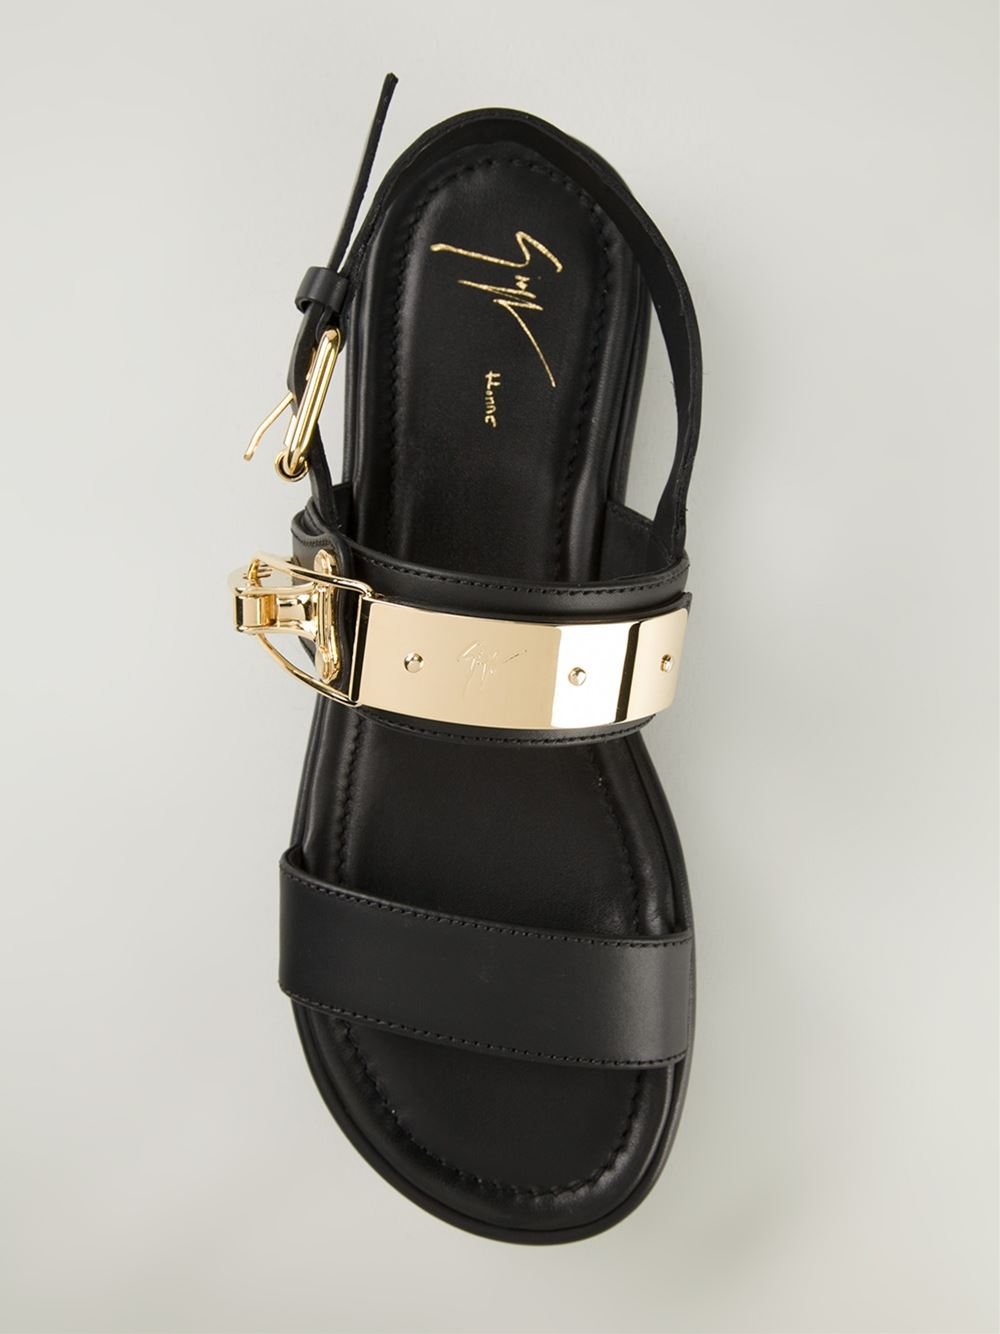 5b50958b0c05 Lyst - Giuseppe Zanotti Clasp Fastening Sandals in Black for Men